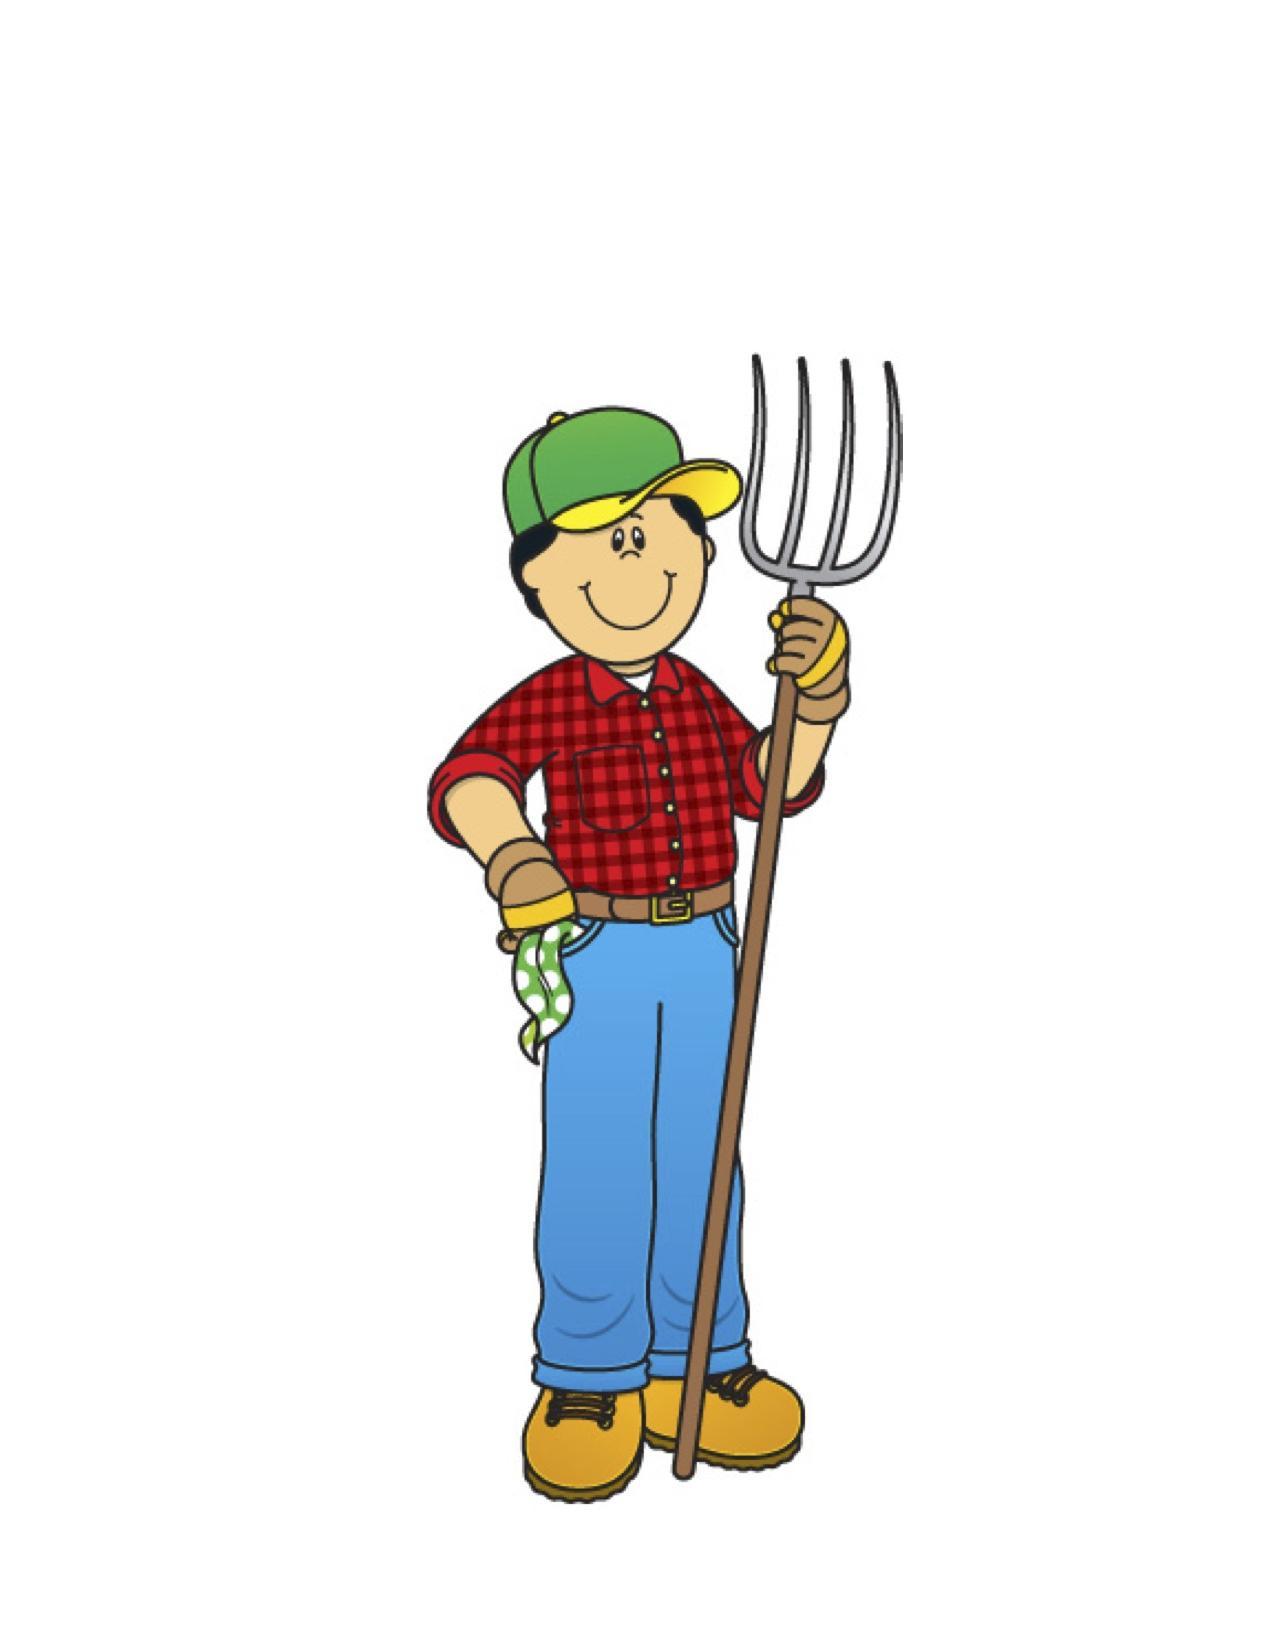 Farmers clipart poor farmer. Free download best